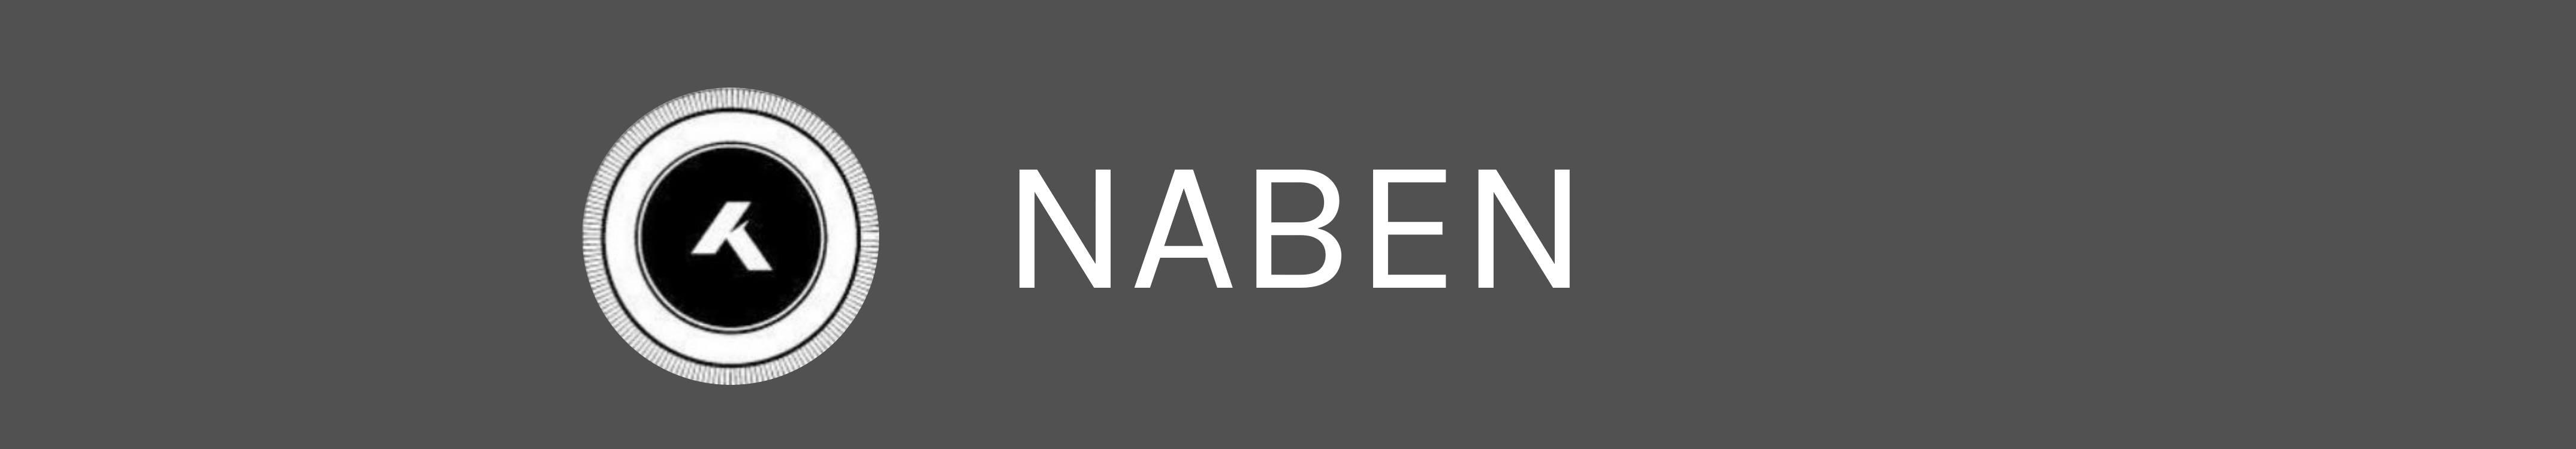 KHE-Banner-Naben